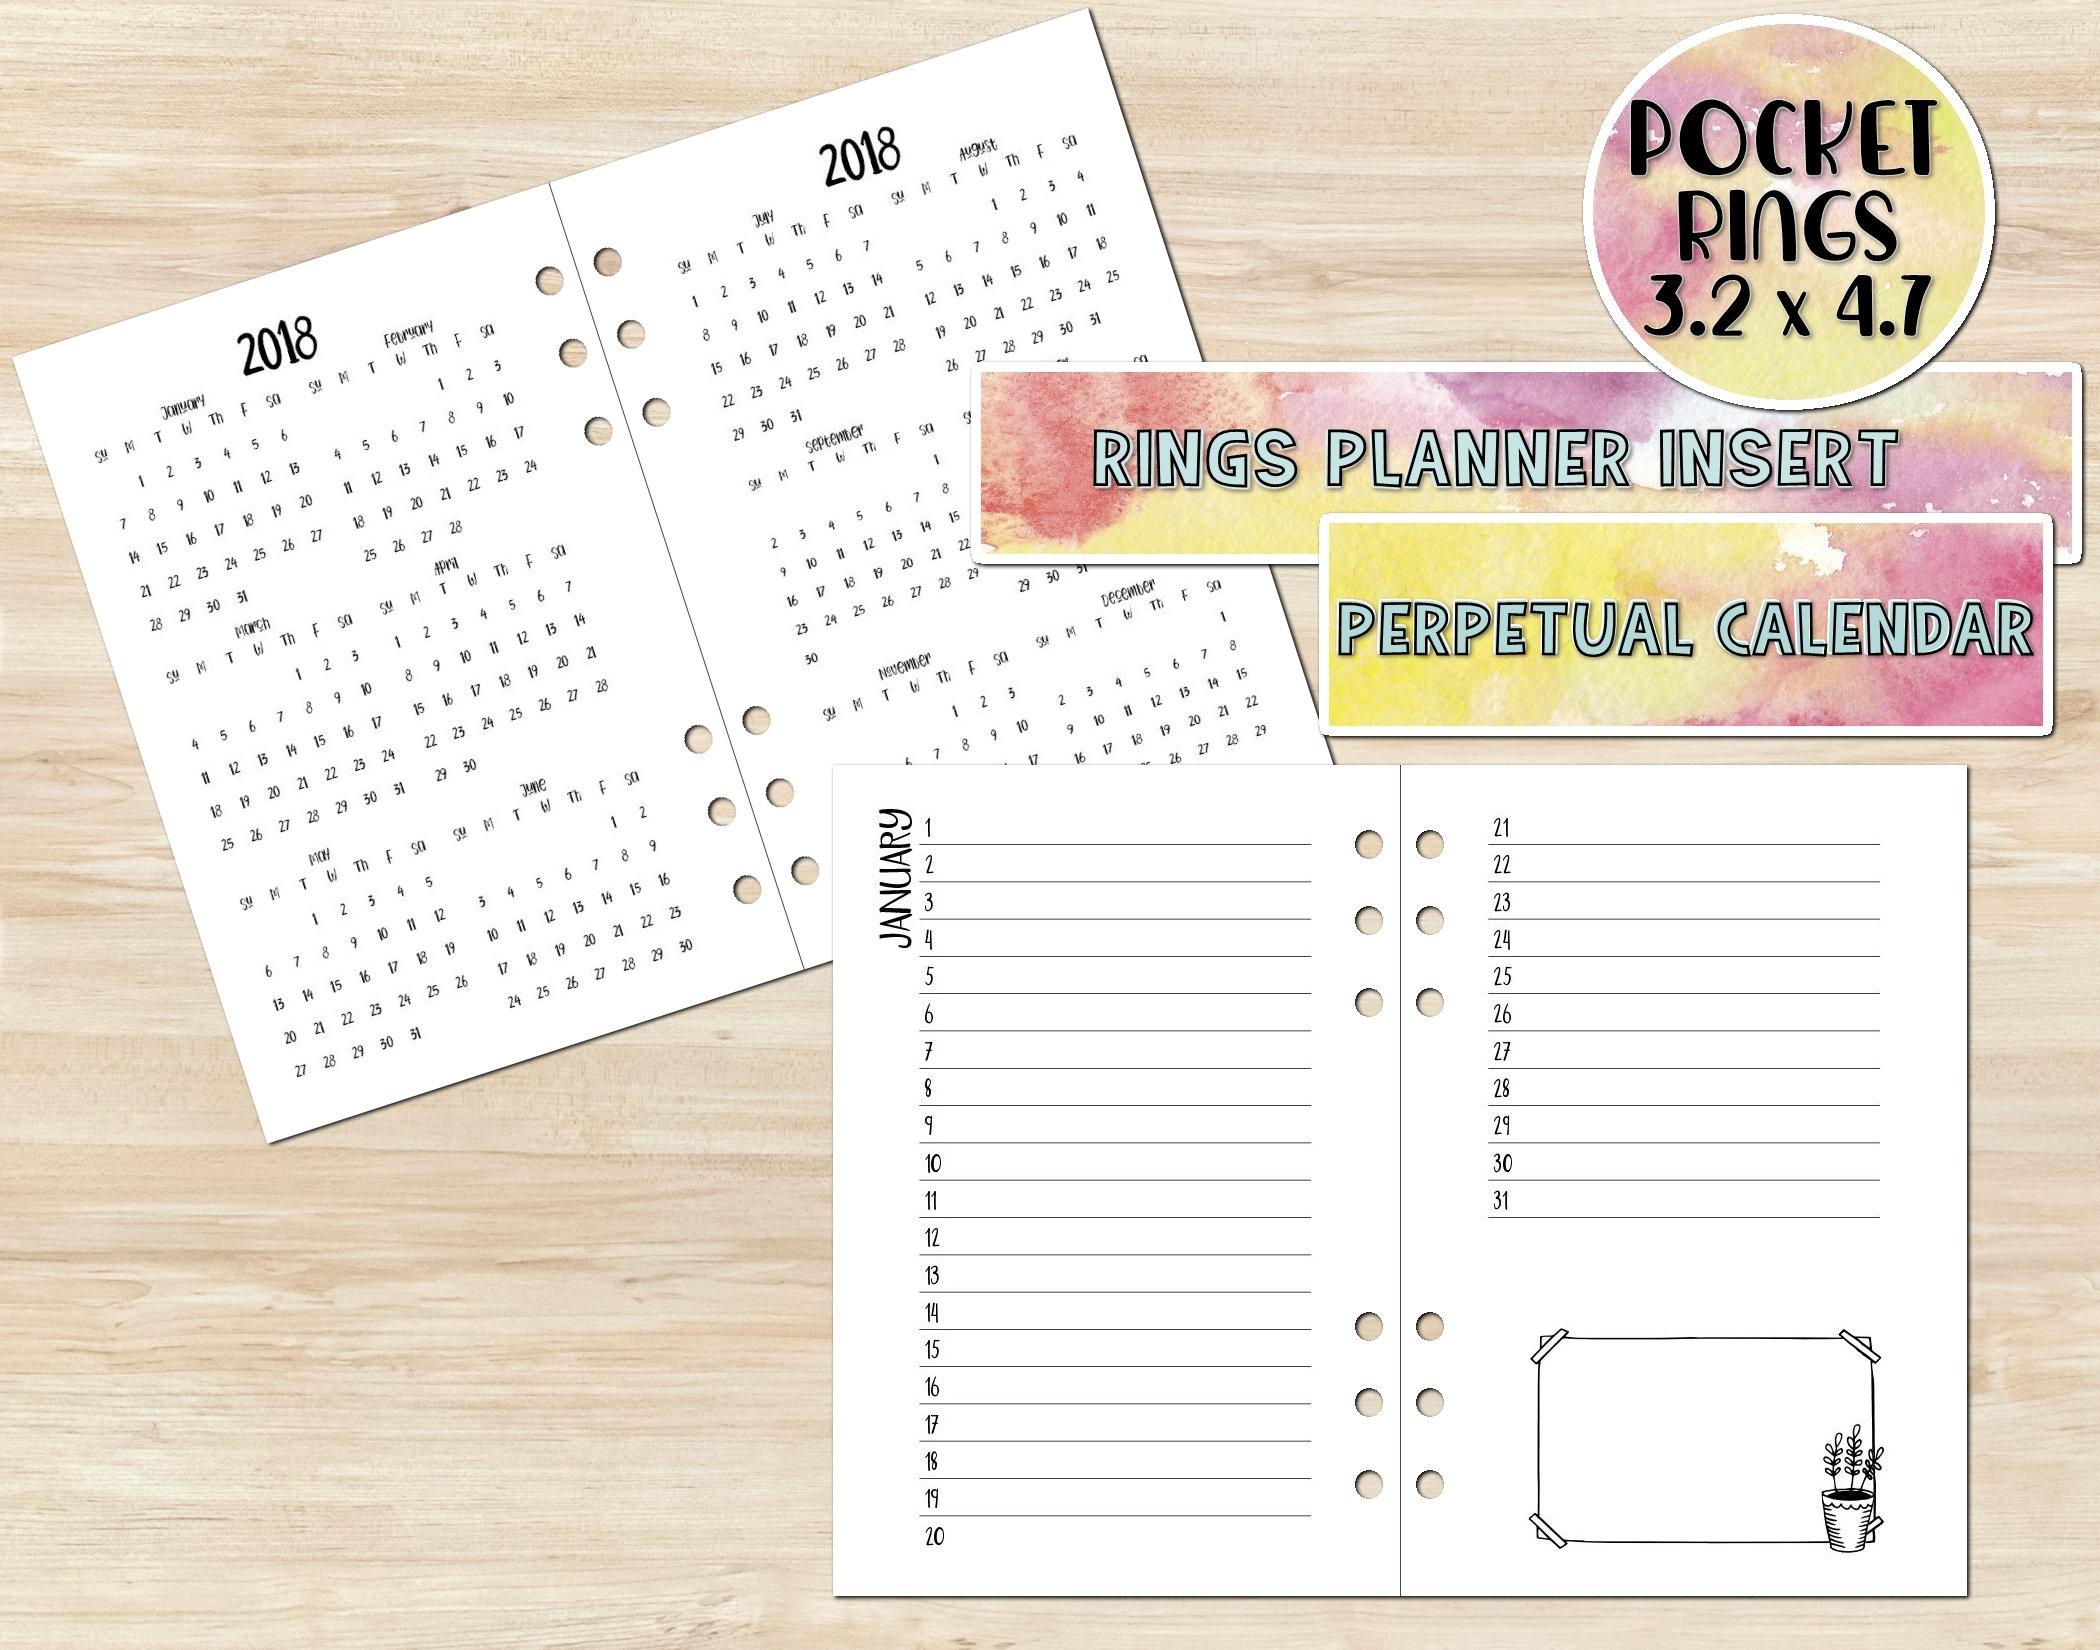 Printable Pocket Rings Insert - Printable Perpetual Calendar - Printable  Planner Insert - Perpetual Calendar Insert - Pocket Rings Insert in Free Printable Perpetual Medicine Calendar